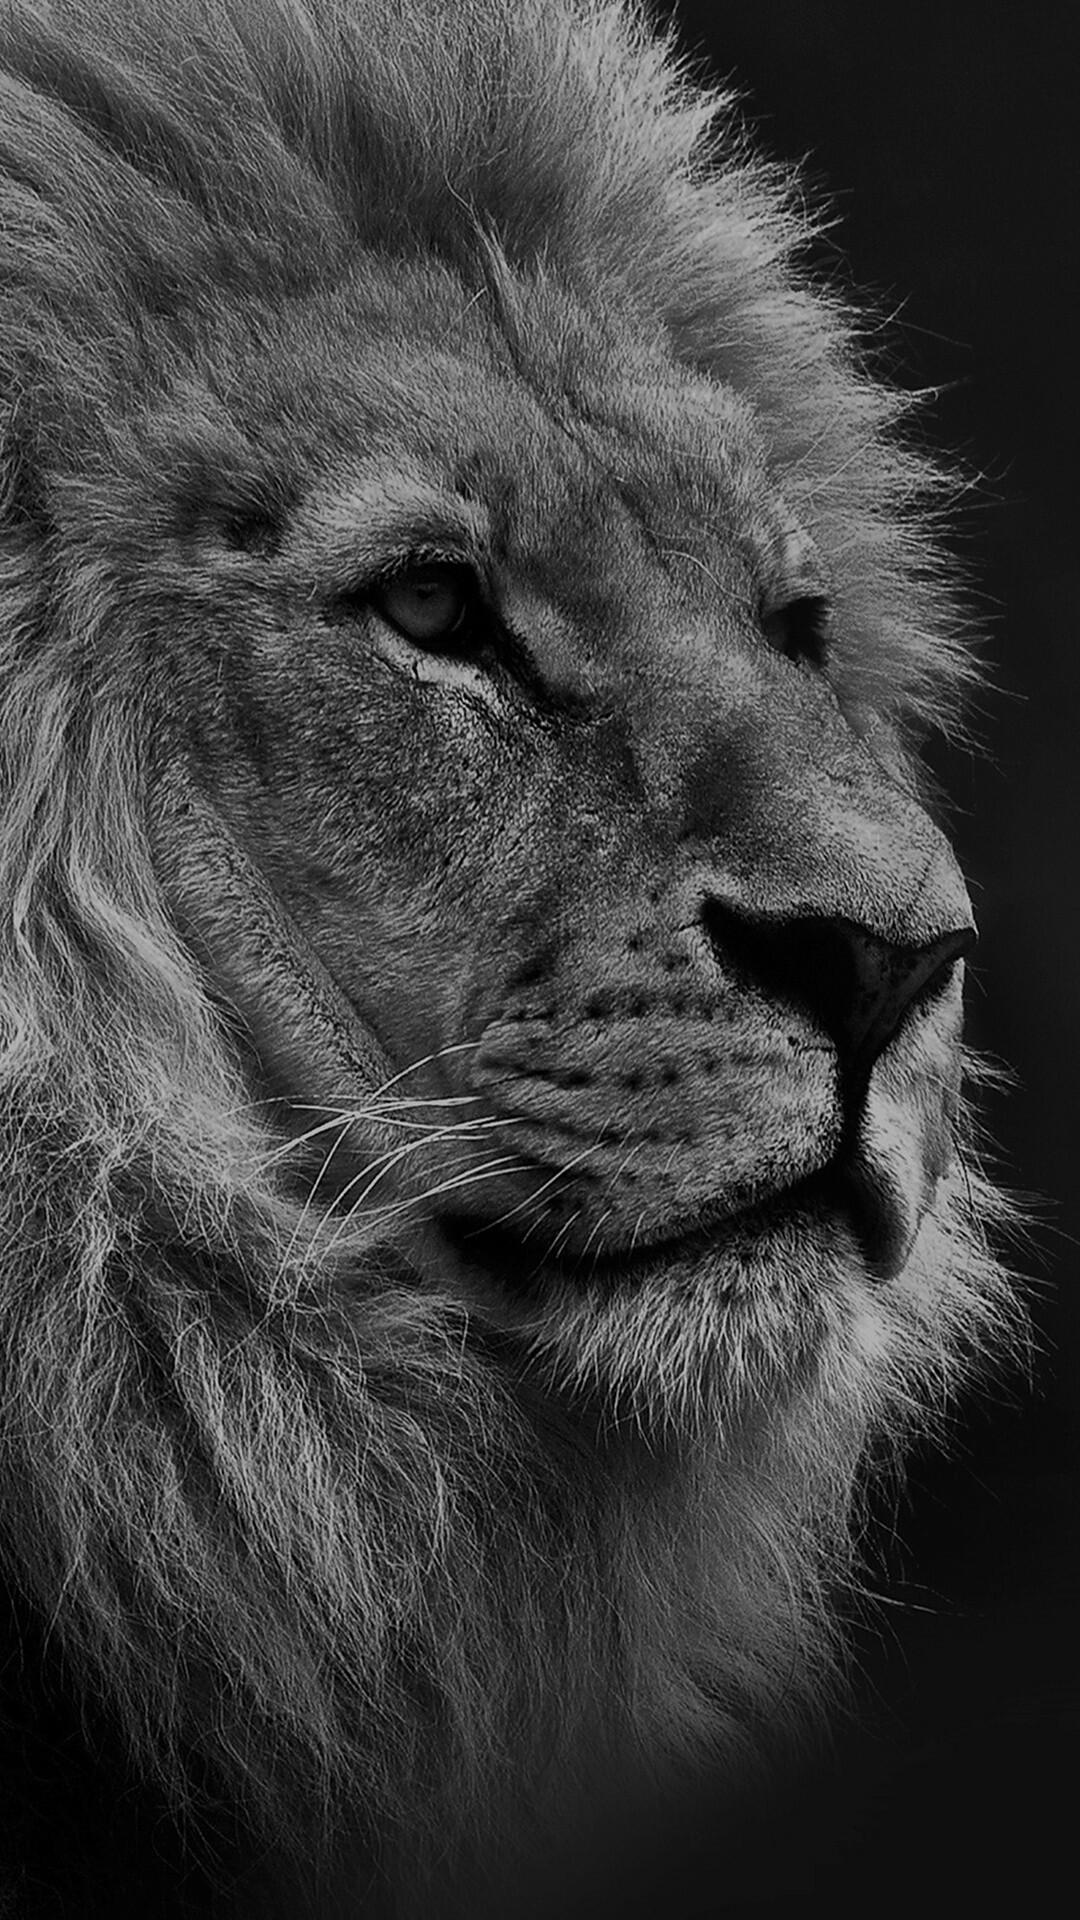 Lion iPhone wallpaper